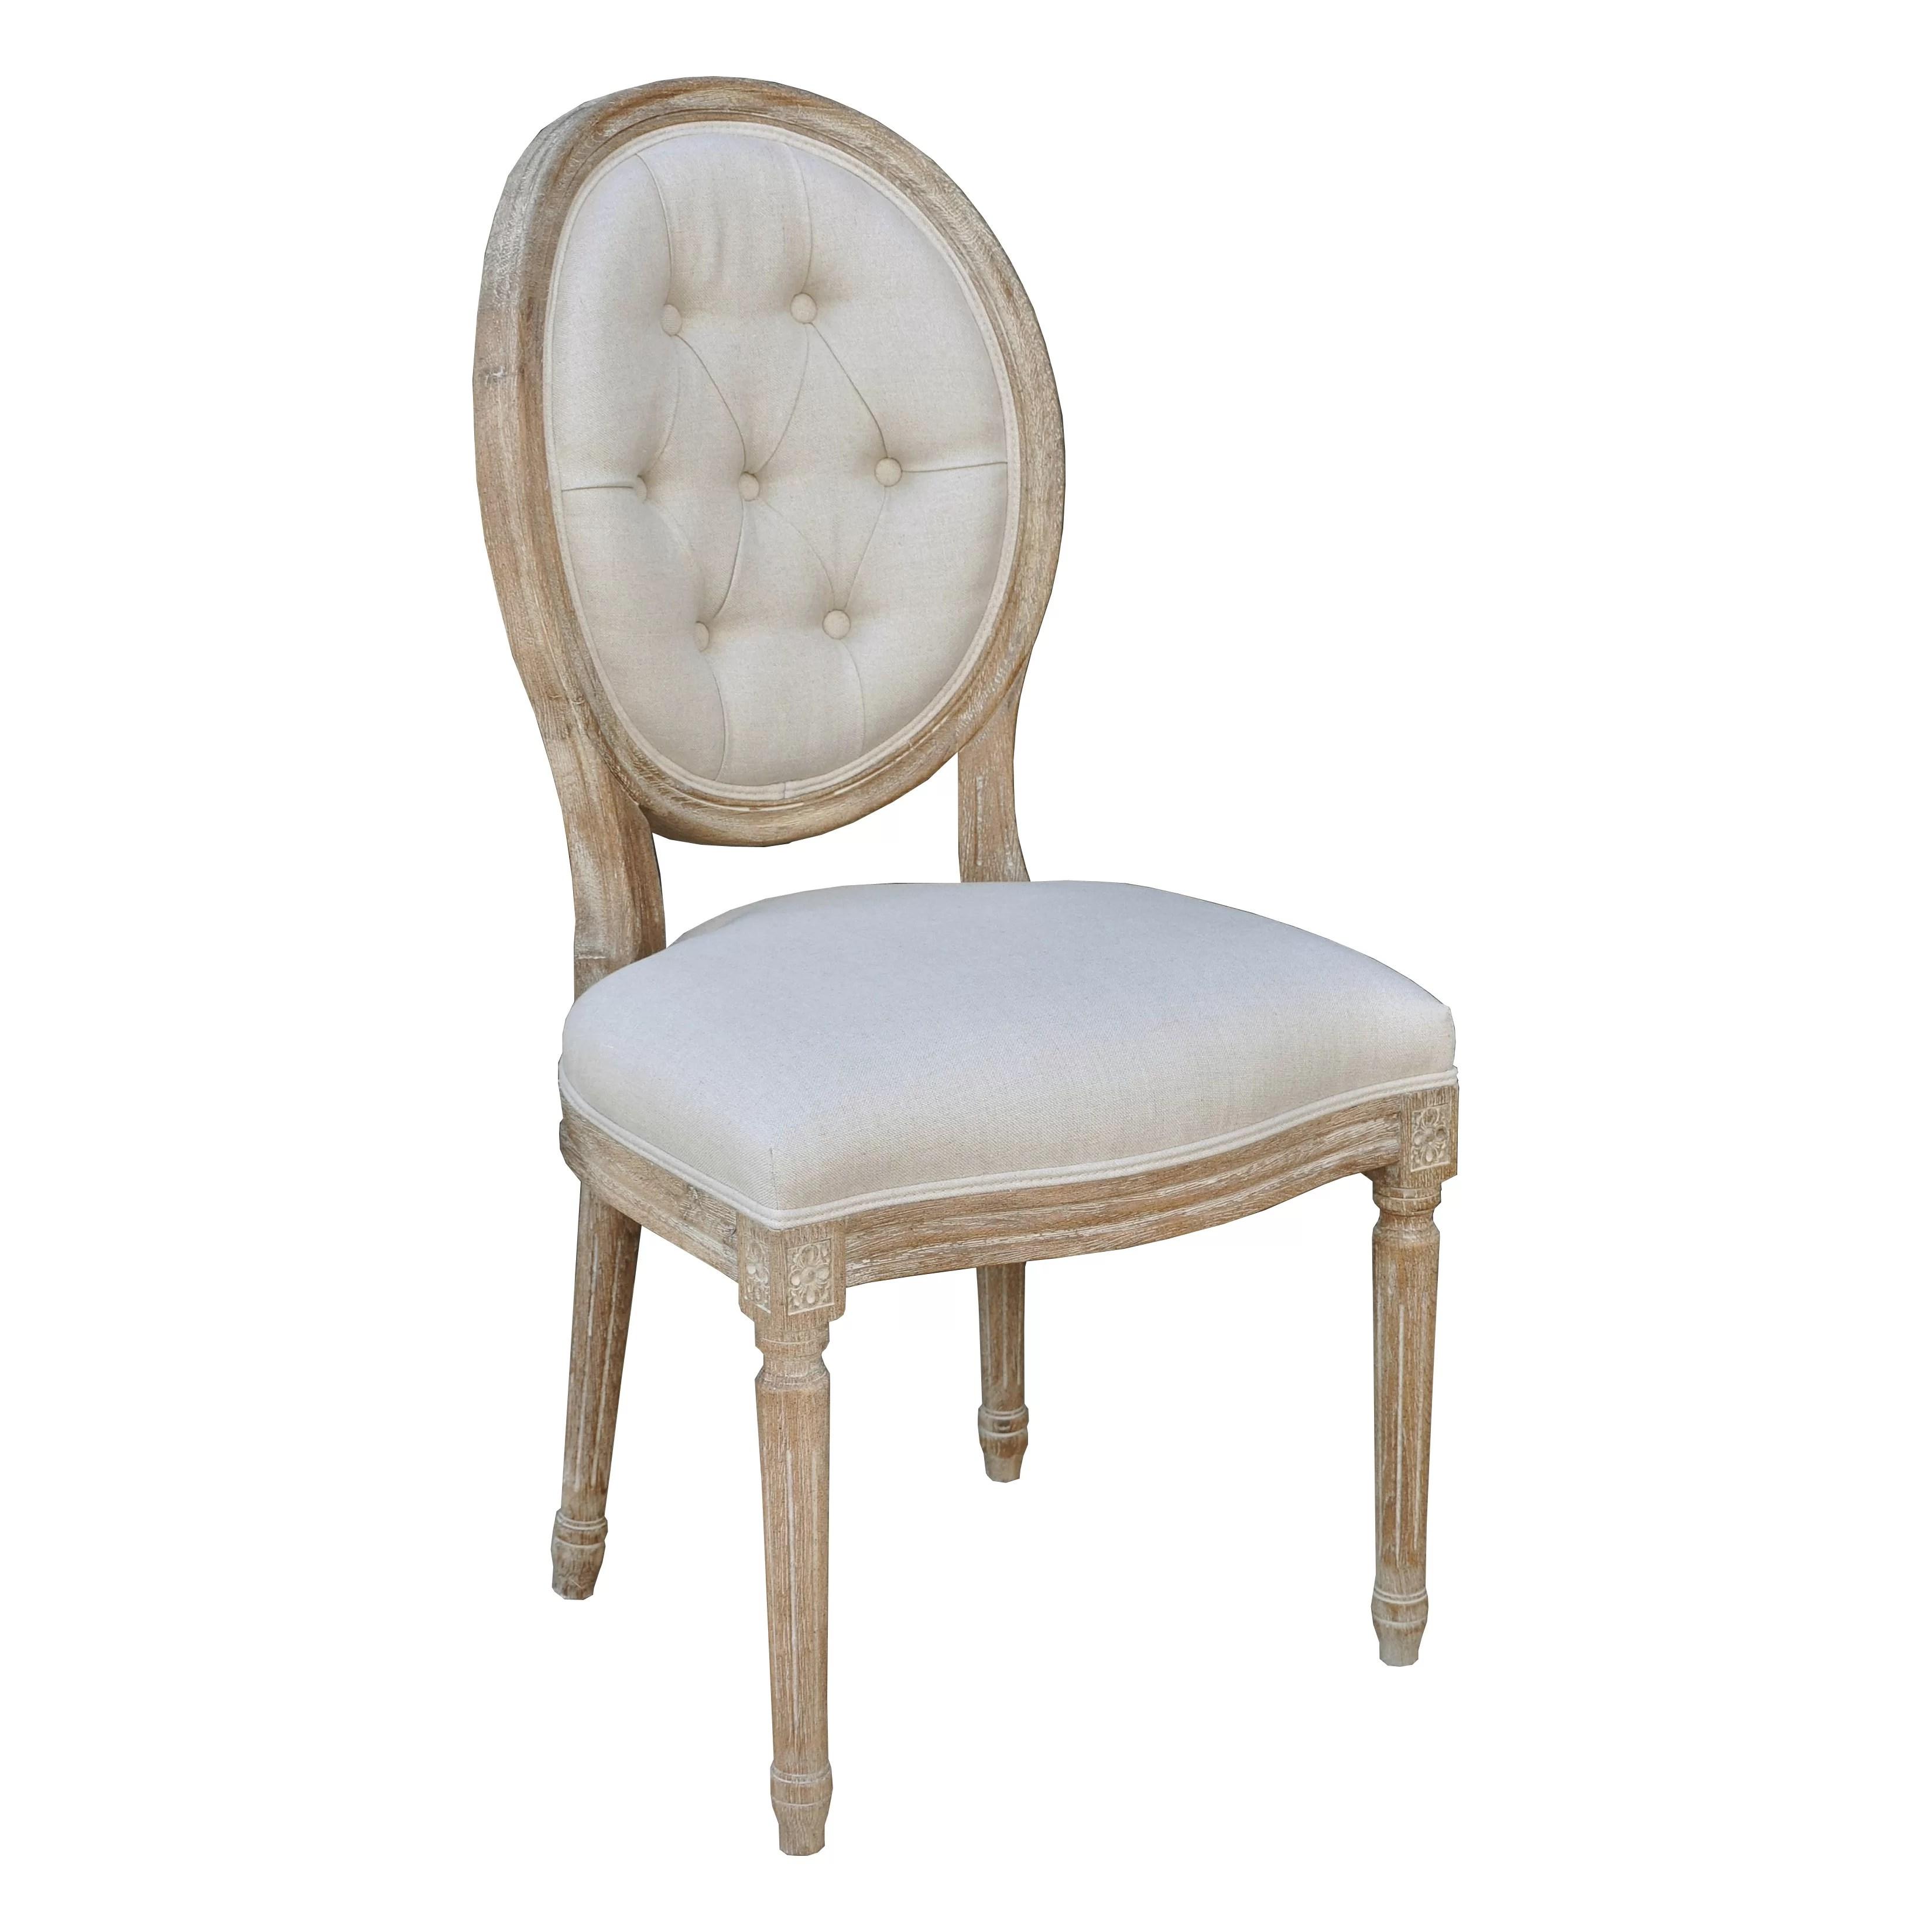 louis dining chairs bamboo baby chair malaysia king side wayfair